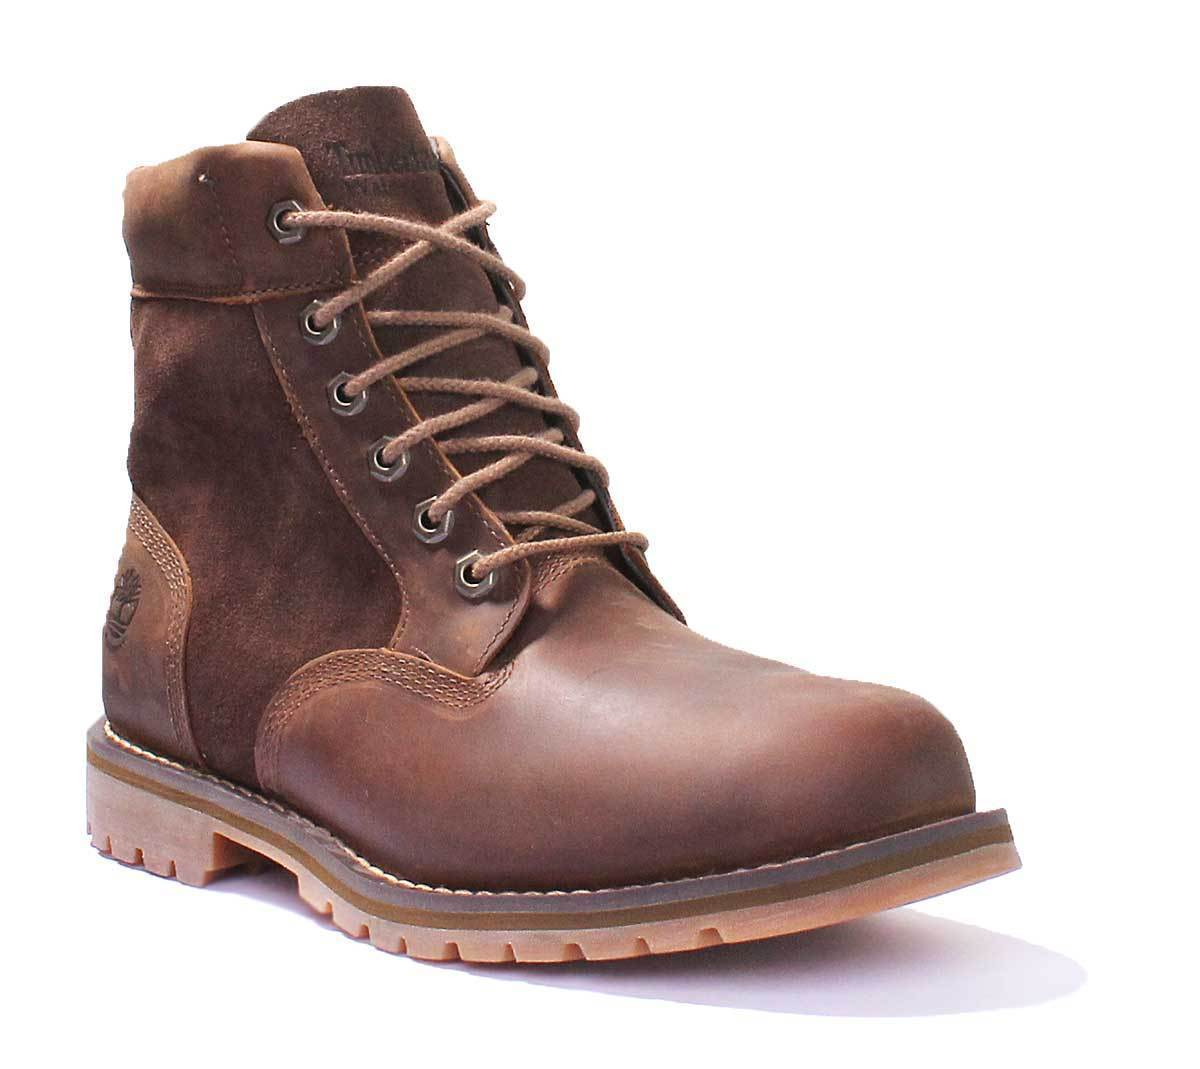 Timberland Uomo Pelle Stivali Chukka Larchmont Coi Lacci Ebay In SrTwS6nq